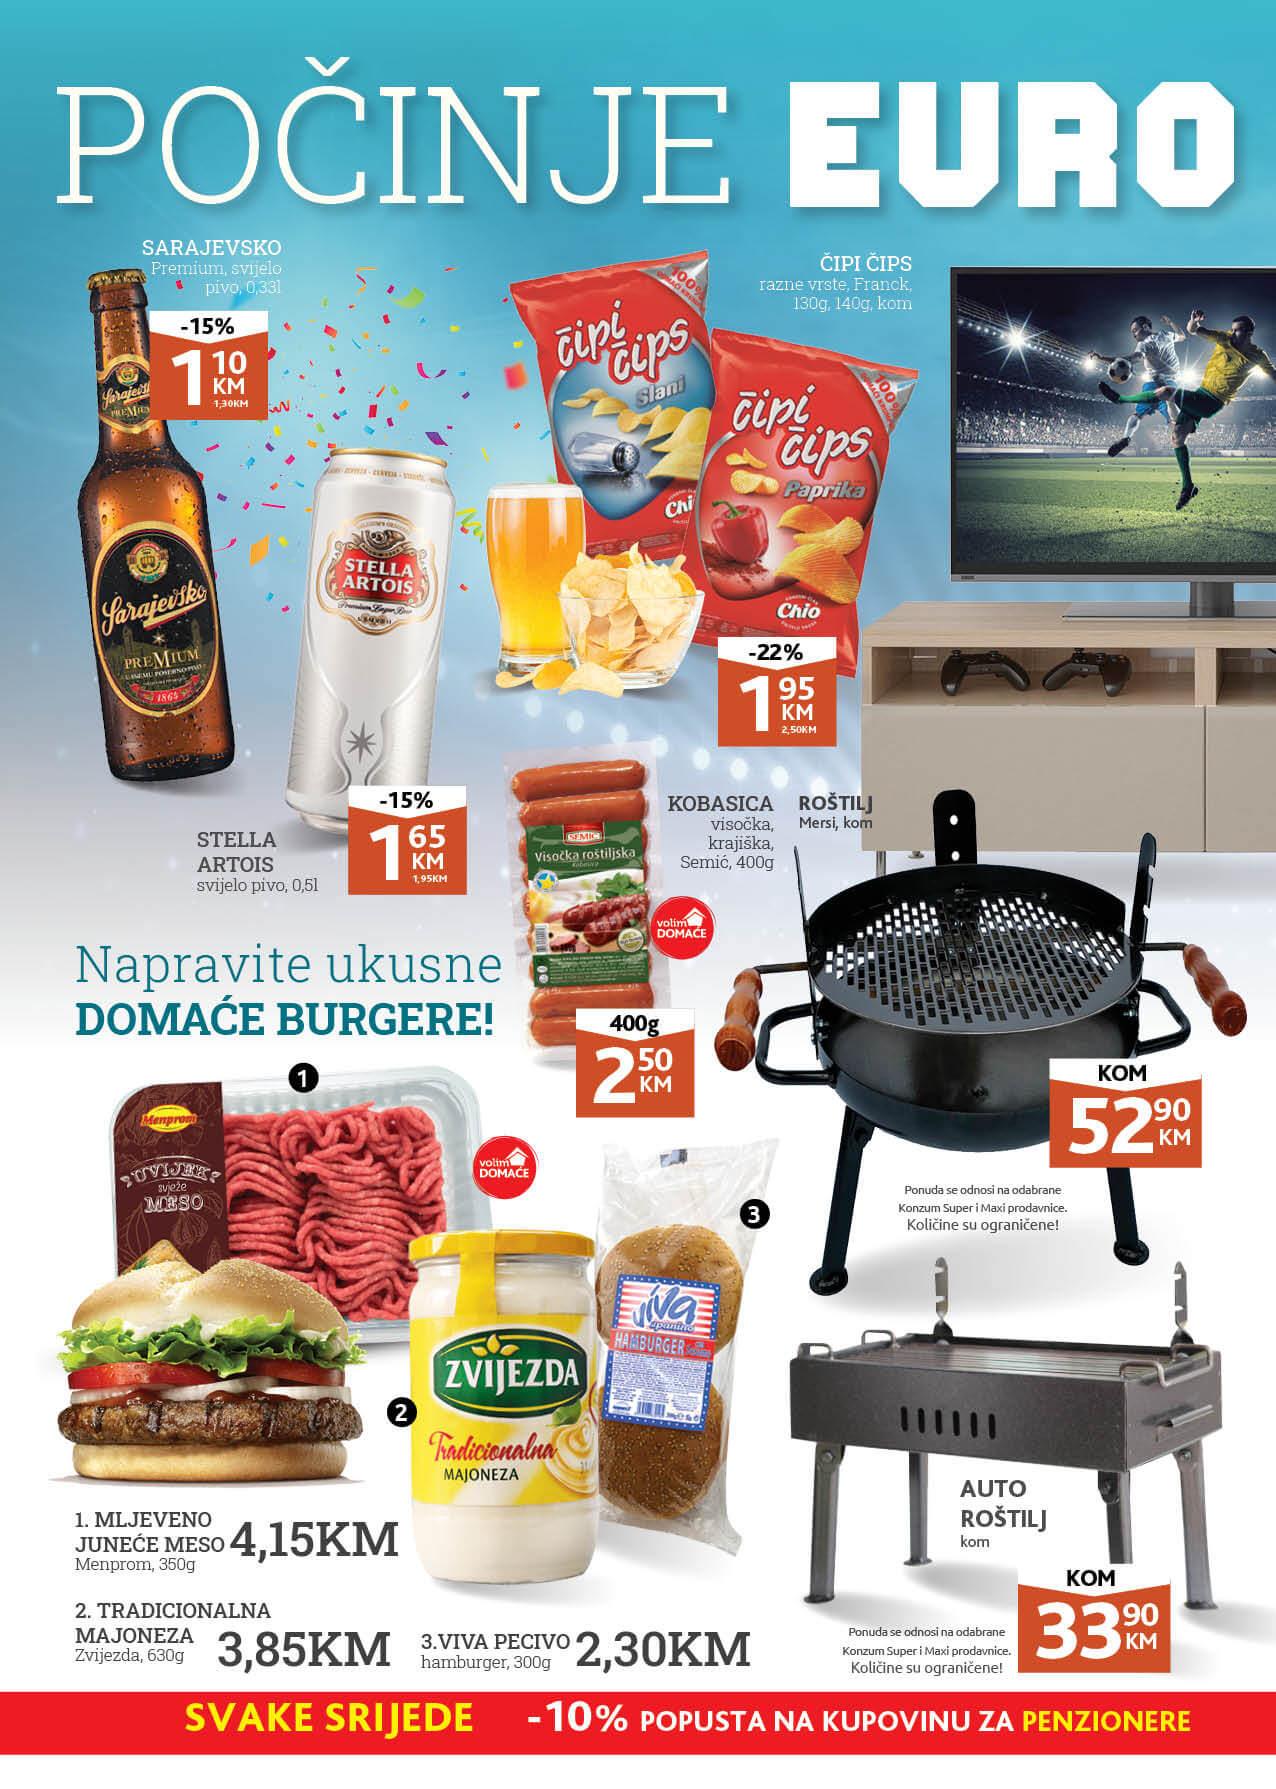 KONZUM Katalog Redovni katalog JUN 2021 07.06. 17.06. eKatalozi.com PR Page 04